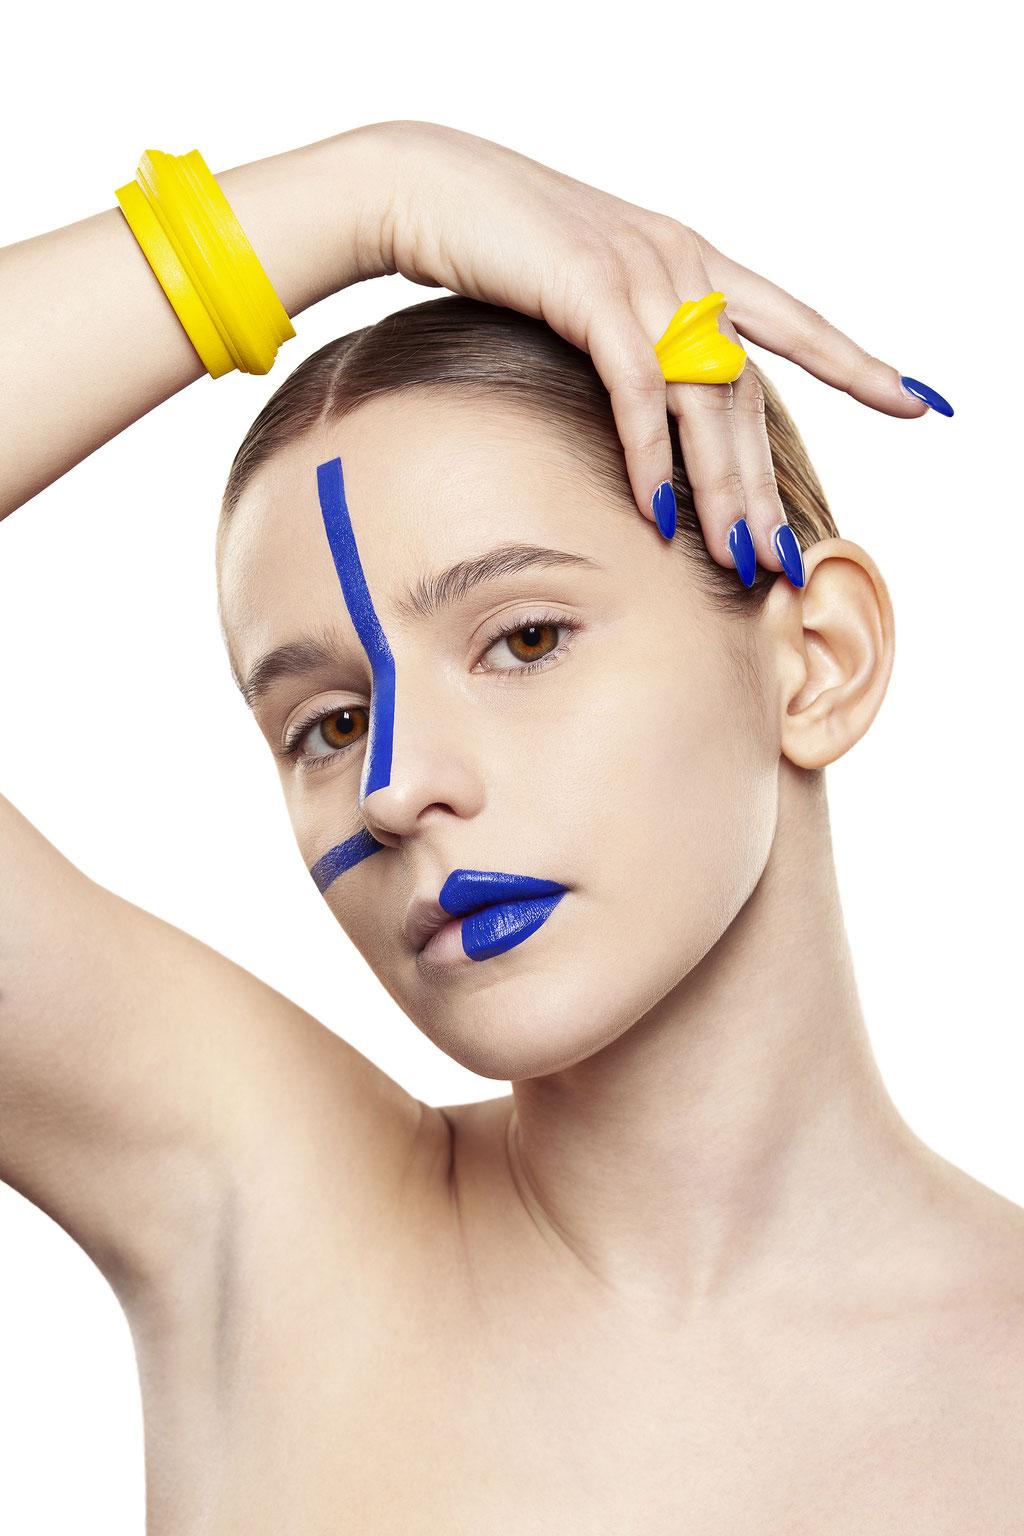 Nobahar Design Milano - contemporary  jewelry - Napoli - Natural dye